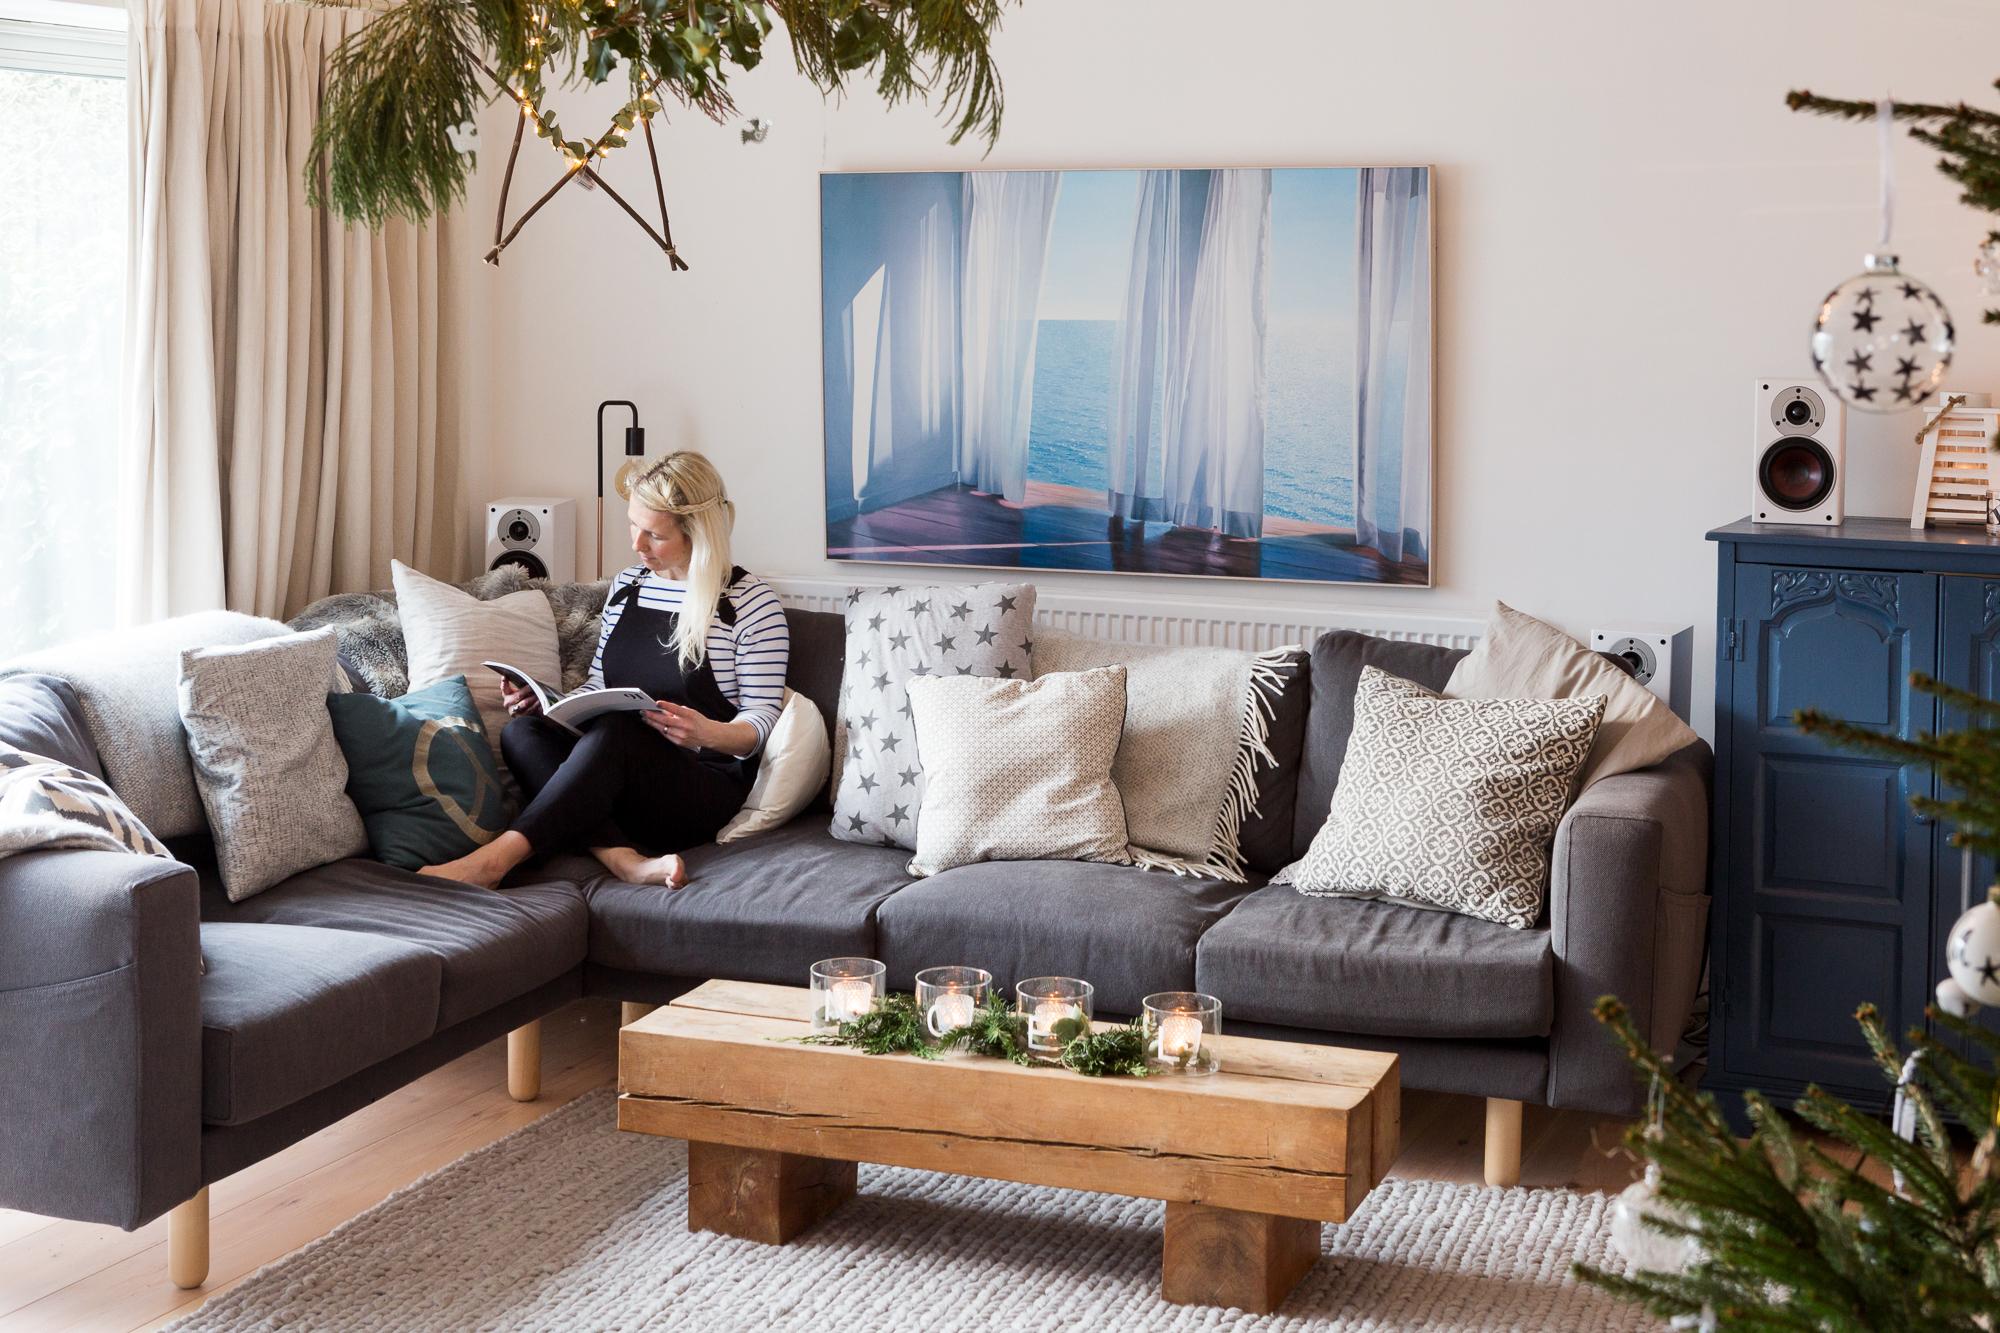 new sofas a designer/stylistu0027s own rustic modern english home KABKHJI